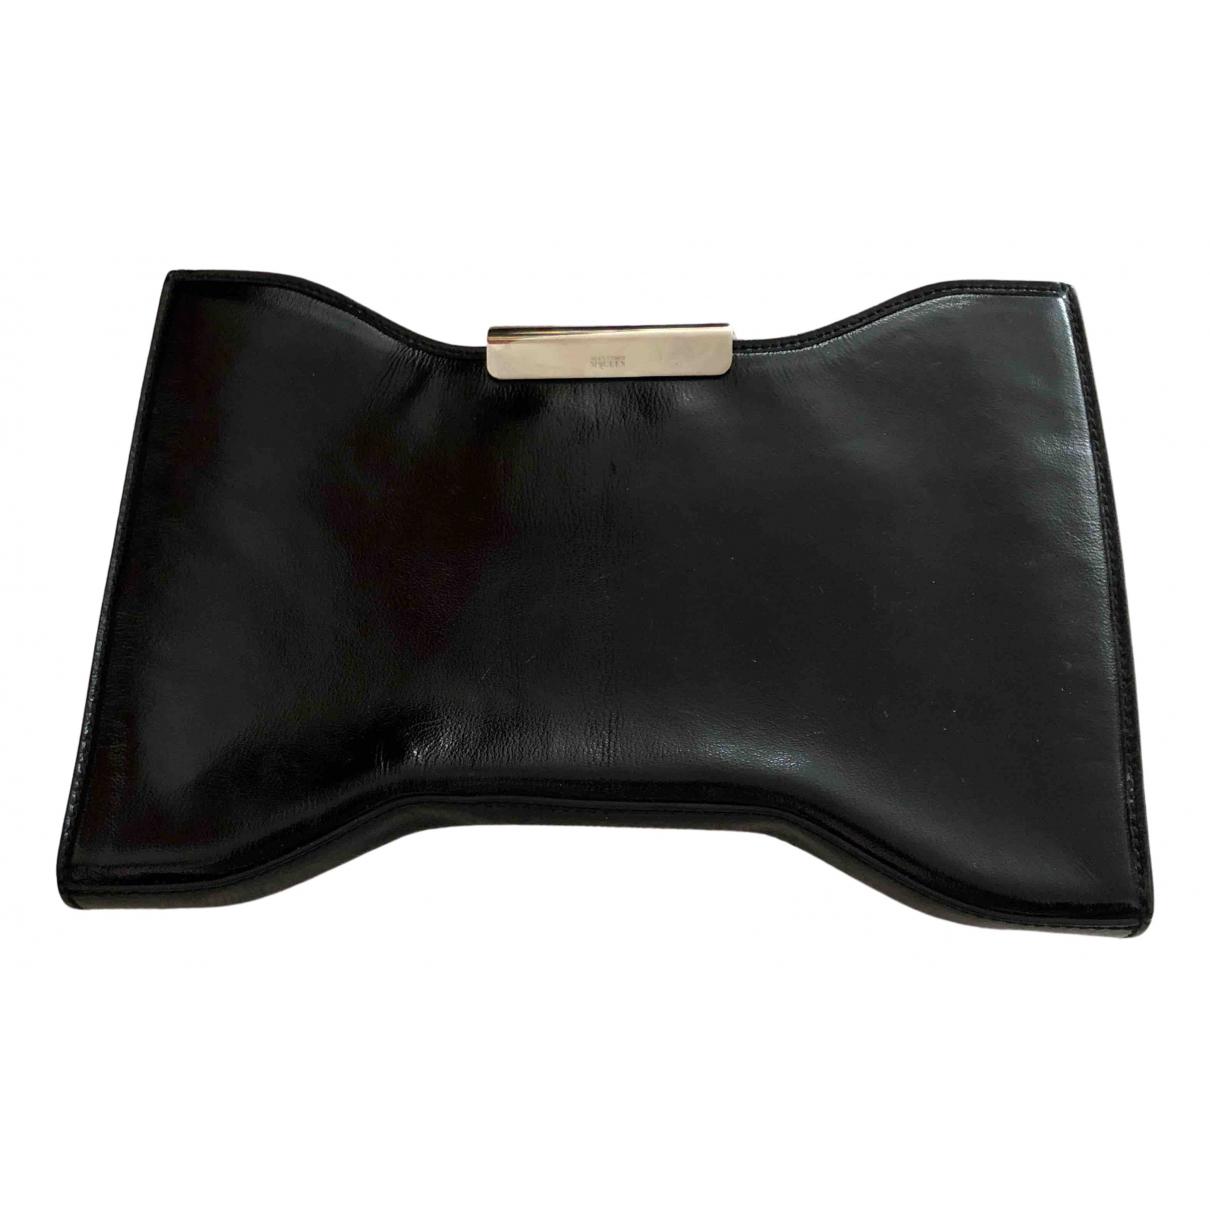 Alexander Mcqueen N Black Leather Clutch bag for Women N